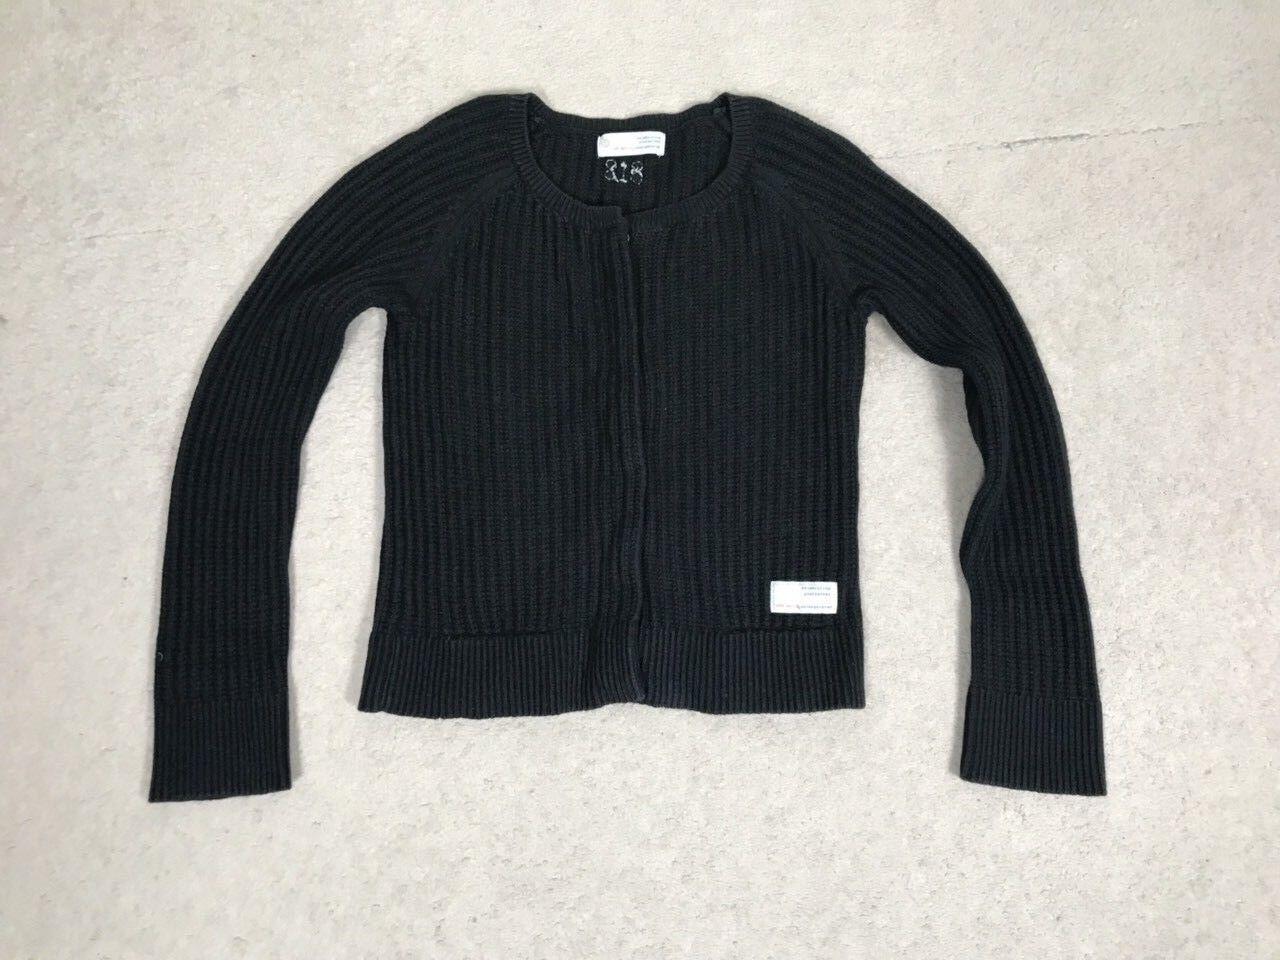 SALE Women's ODD MOLLY Knitted bluee Long Sleeve Cardigan Sweater Top Size 0